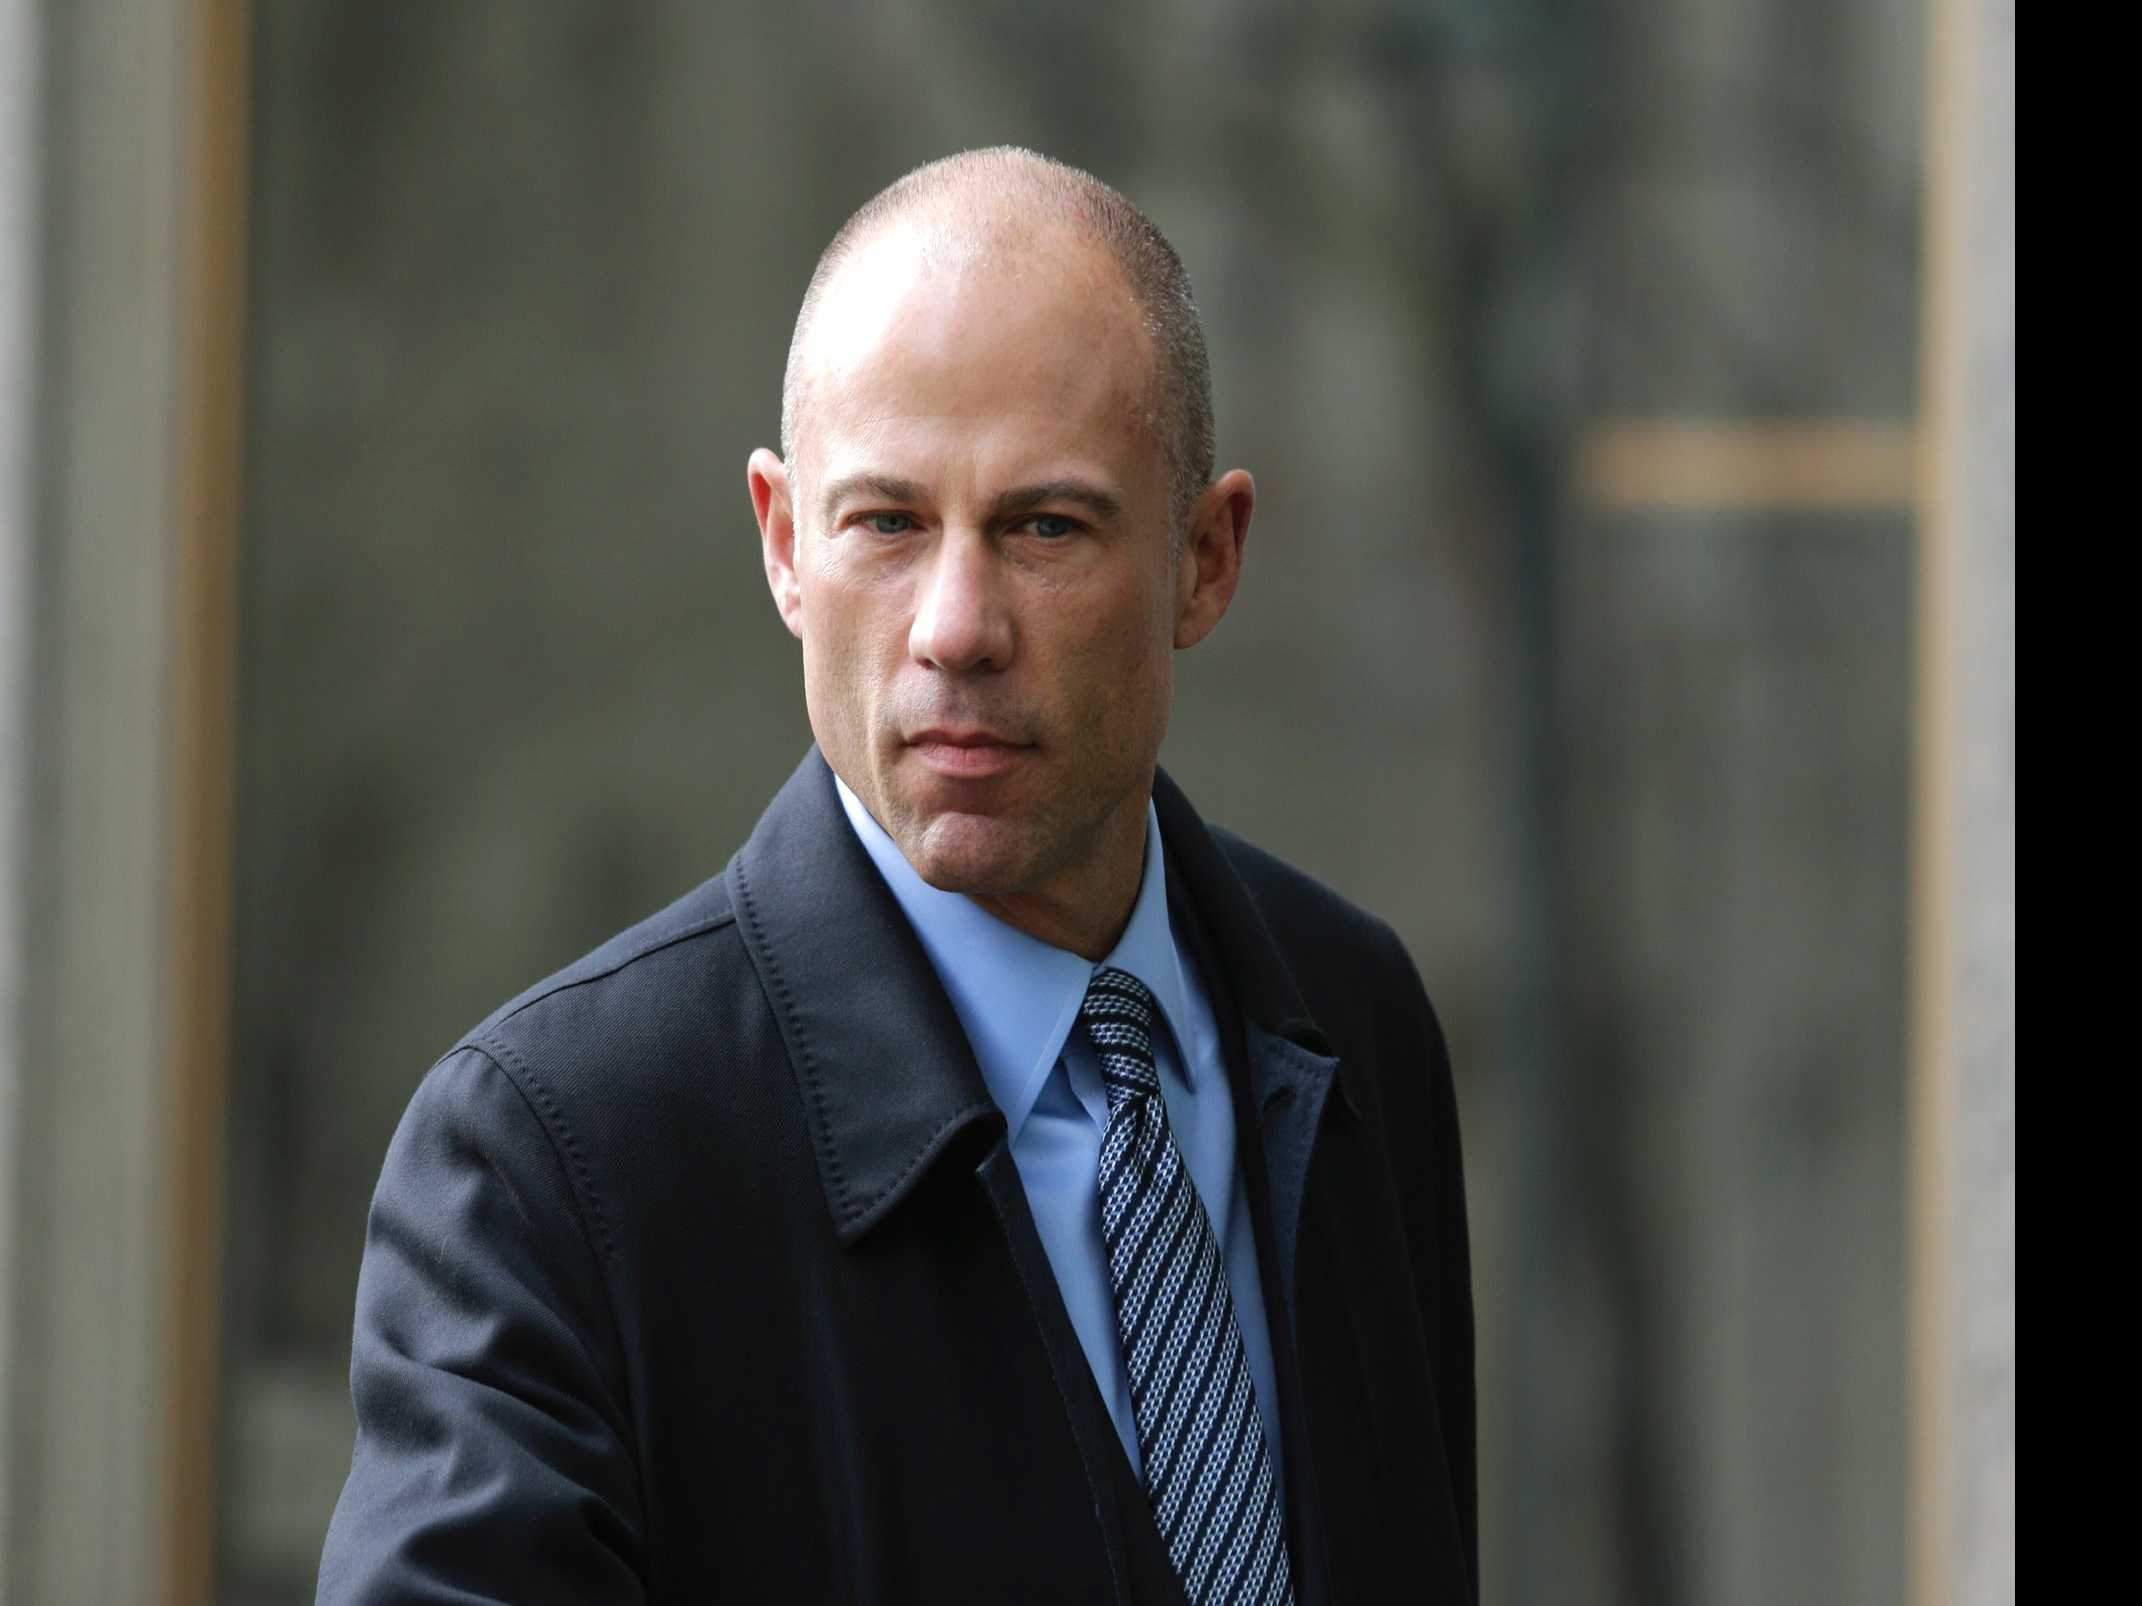 Stormy Daniels' Lawyer Renews Efforts to Depose Trump